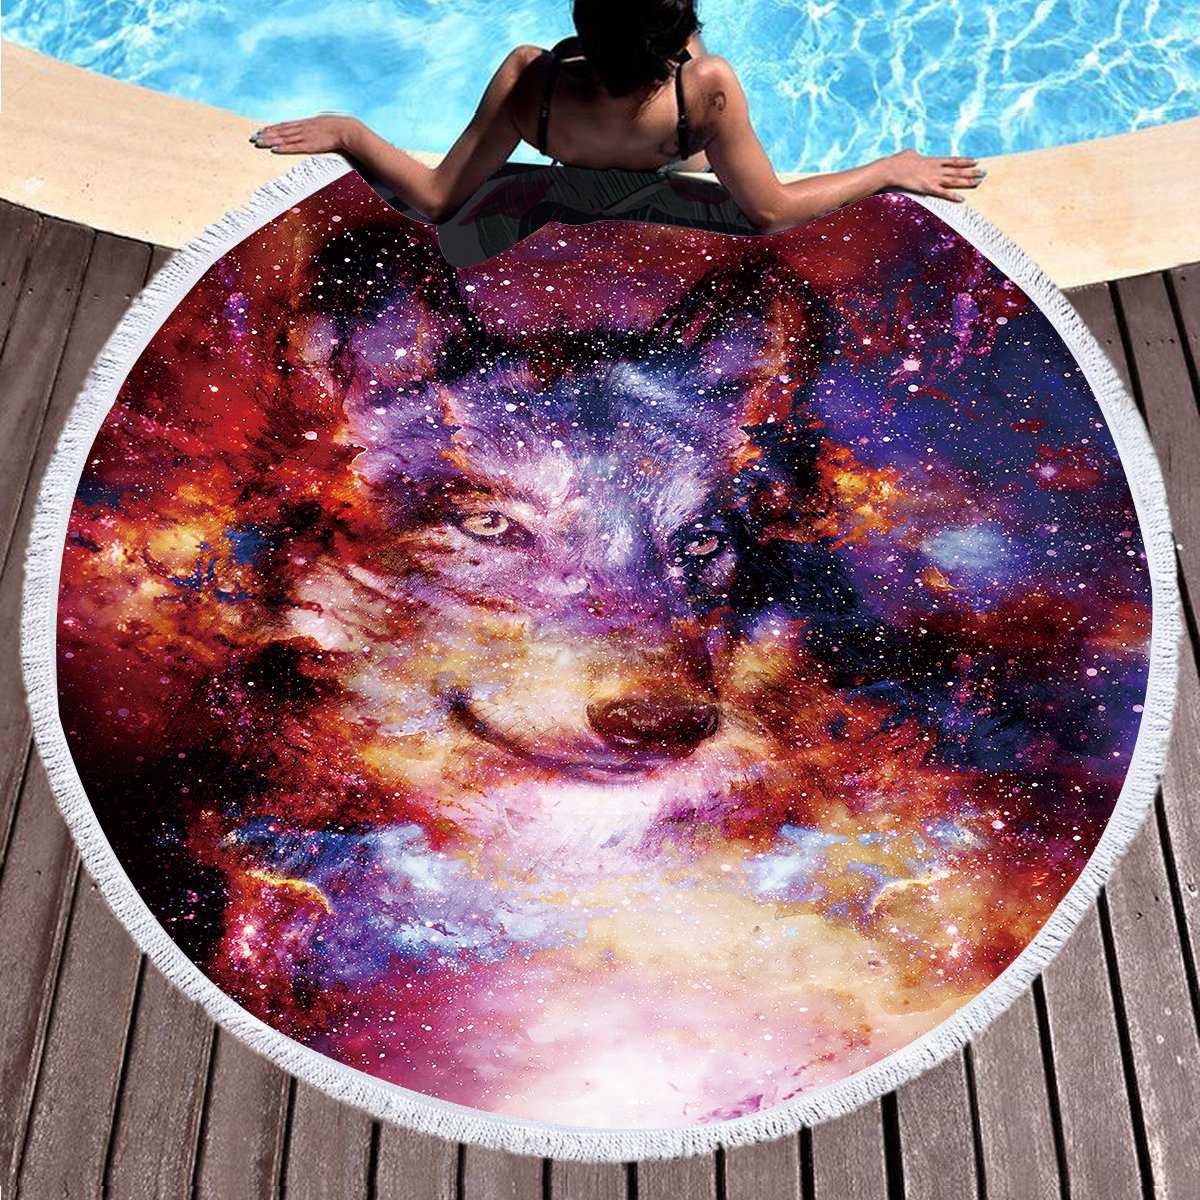 Sleepwish Wolf Beach Towel Galaxy Animal Tapestry Round Beach Blanket Towel Terry Beach Roundie Circle Yoga Mat with Fringe (Galaxy Wolf, 60'' Roundie approx)